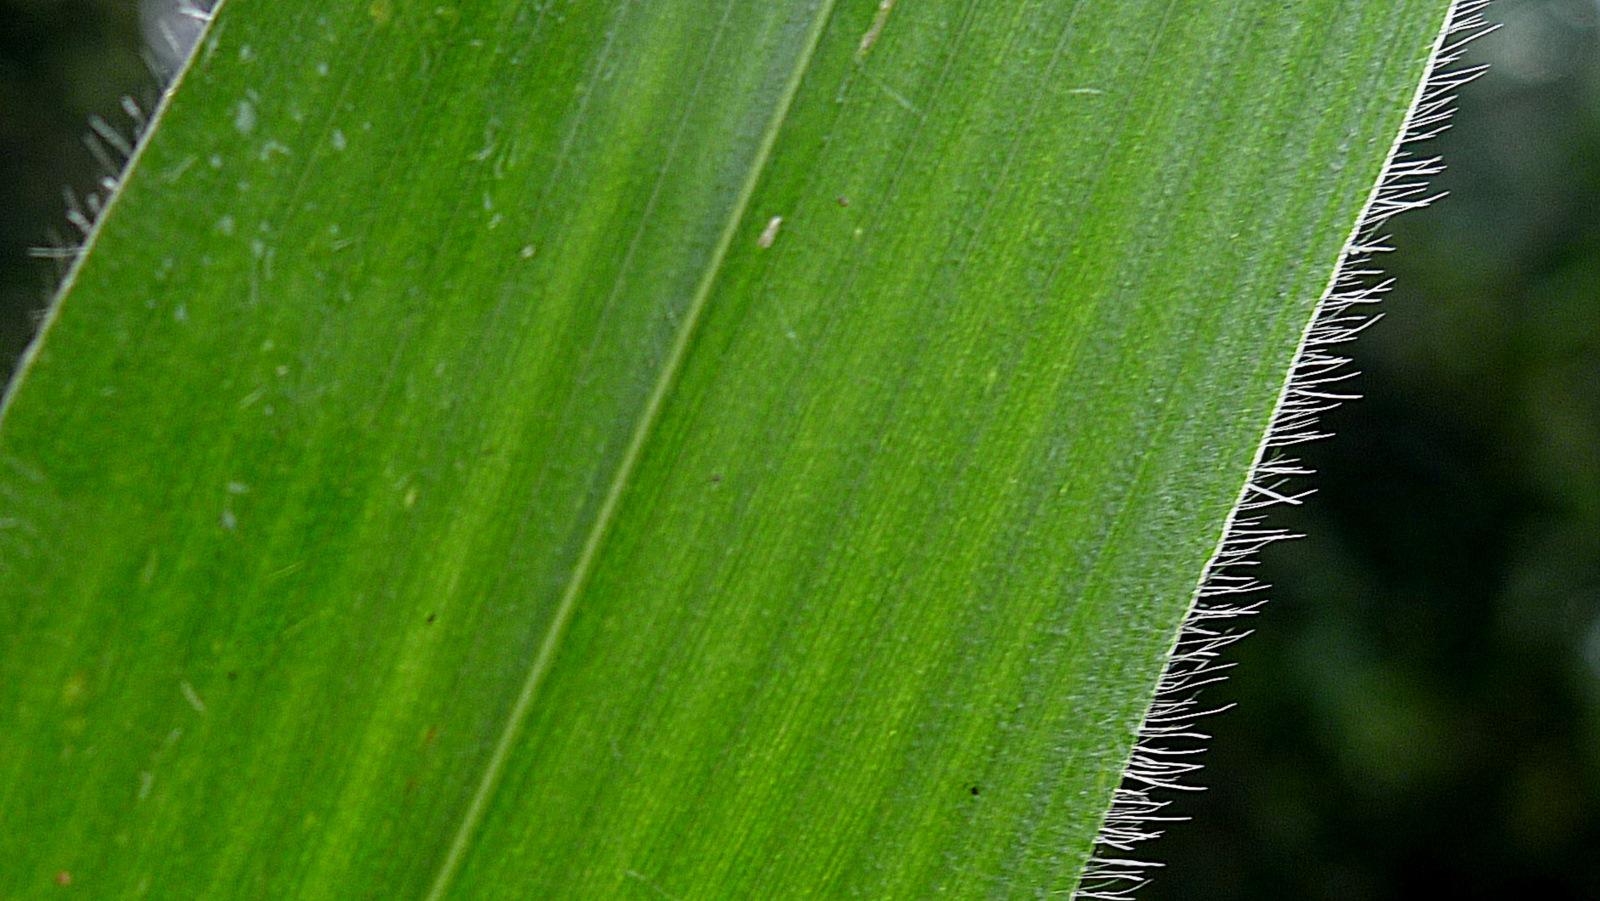 Image of plains bristlegrass